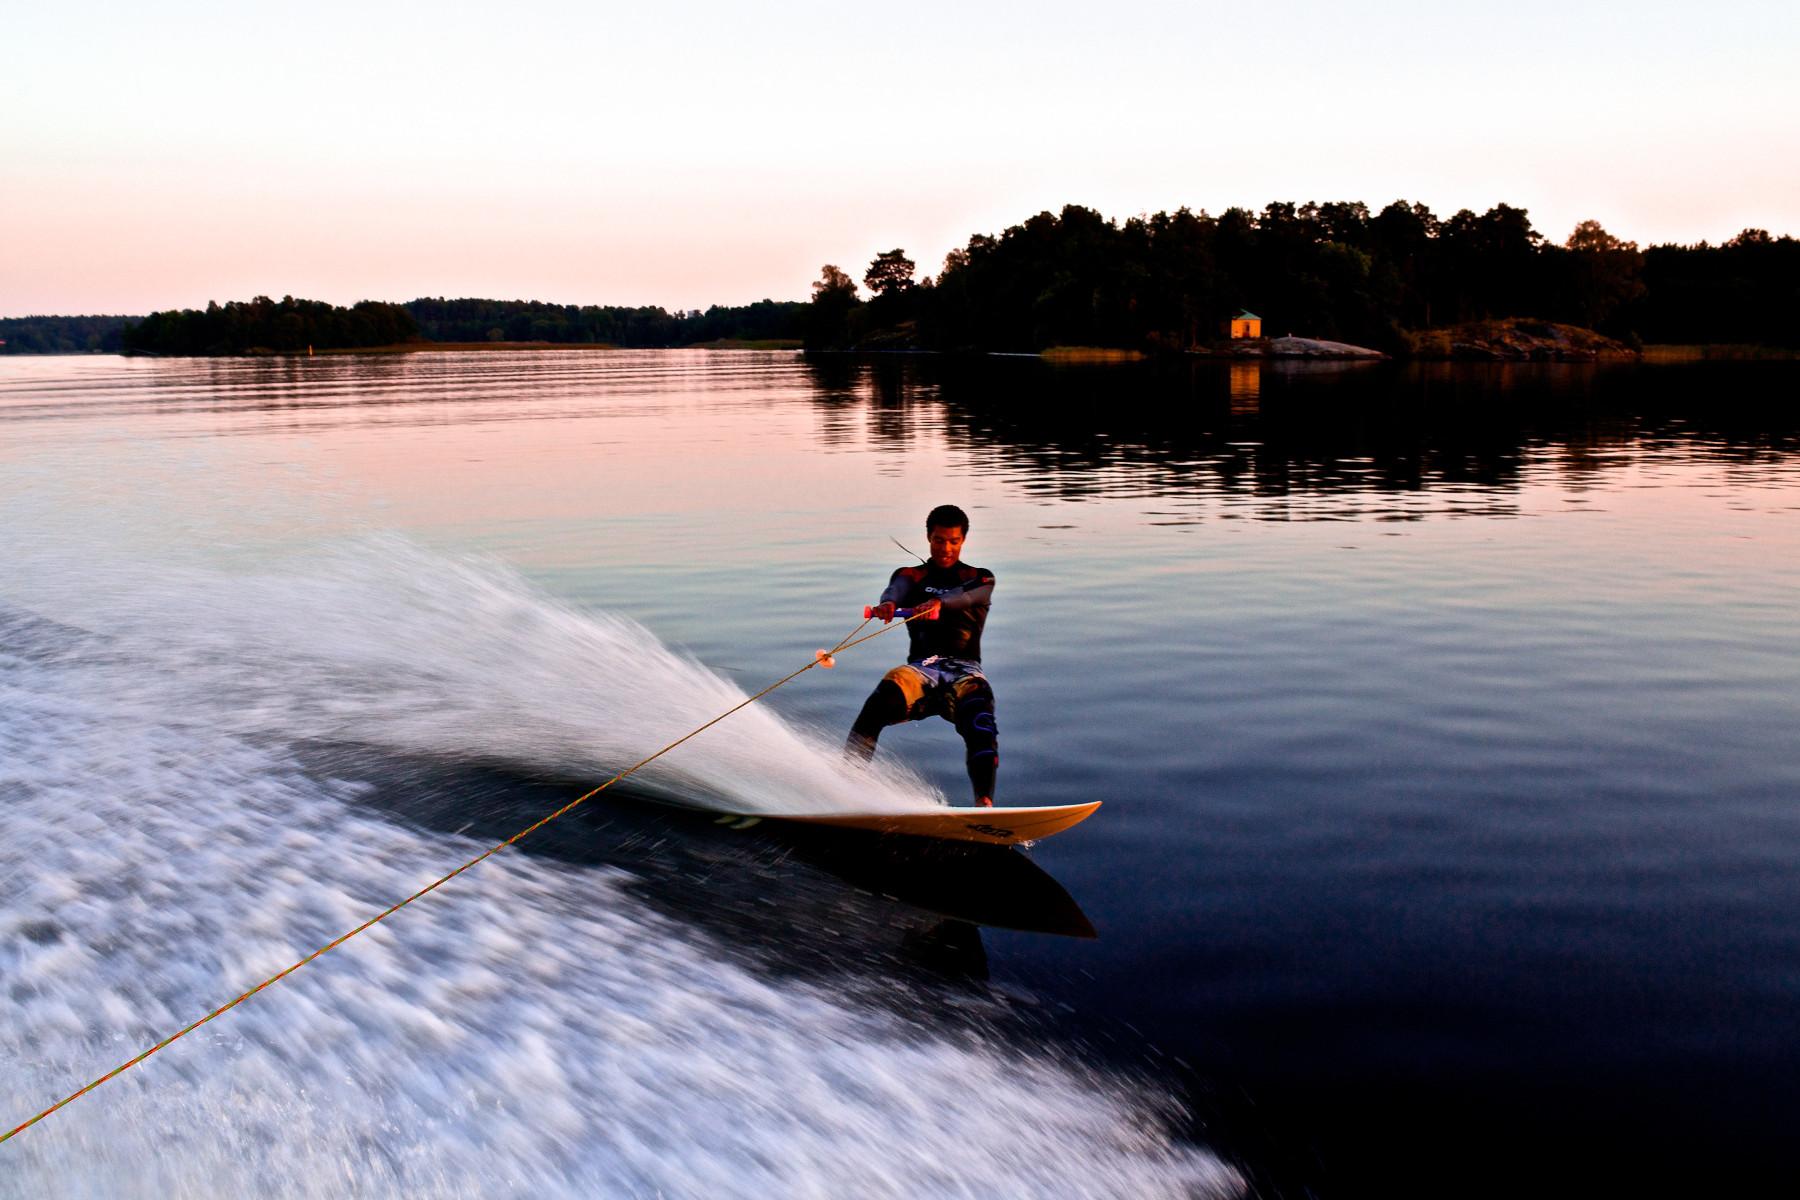 Watersports- ski, wake, surf and tubes